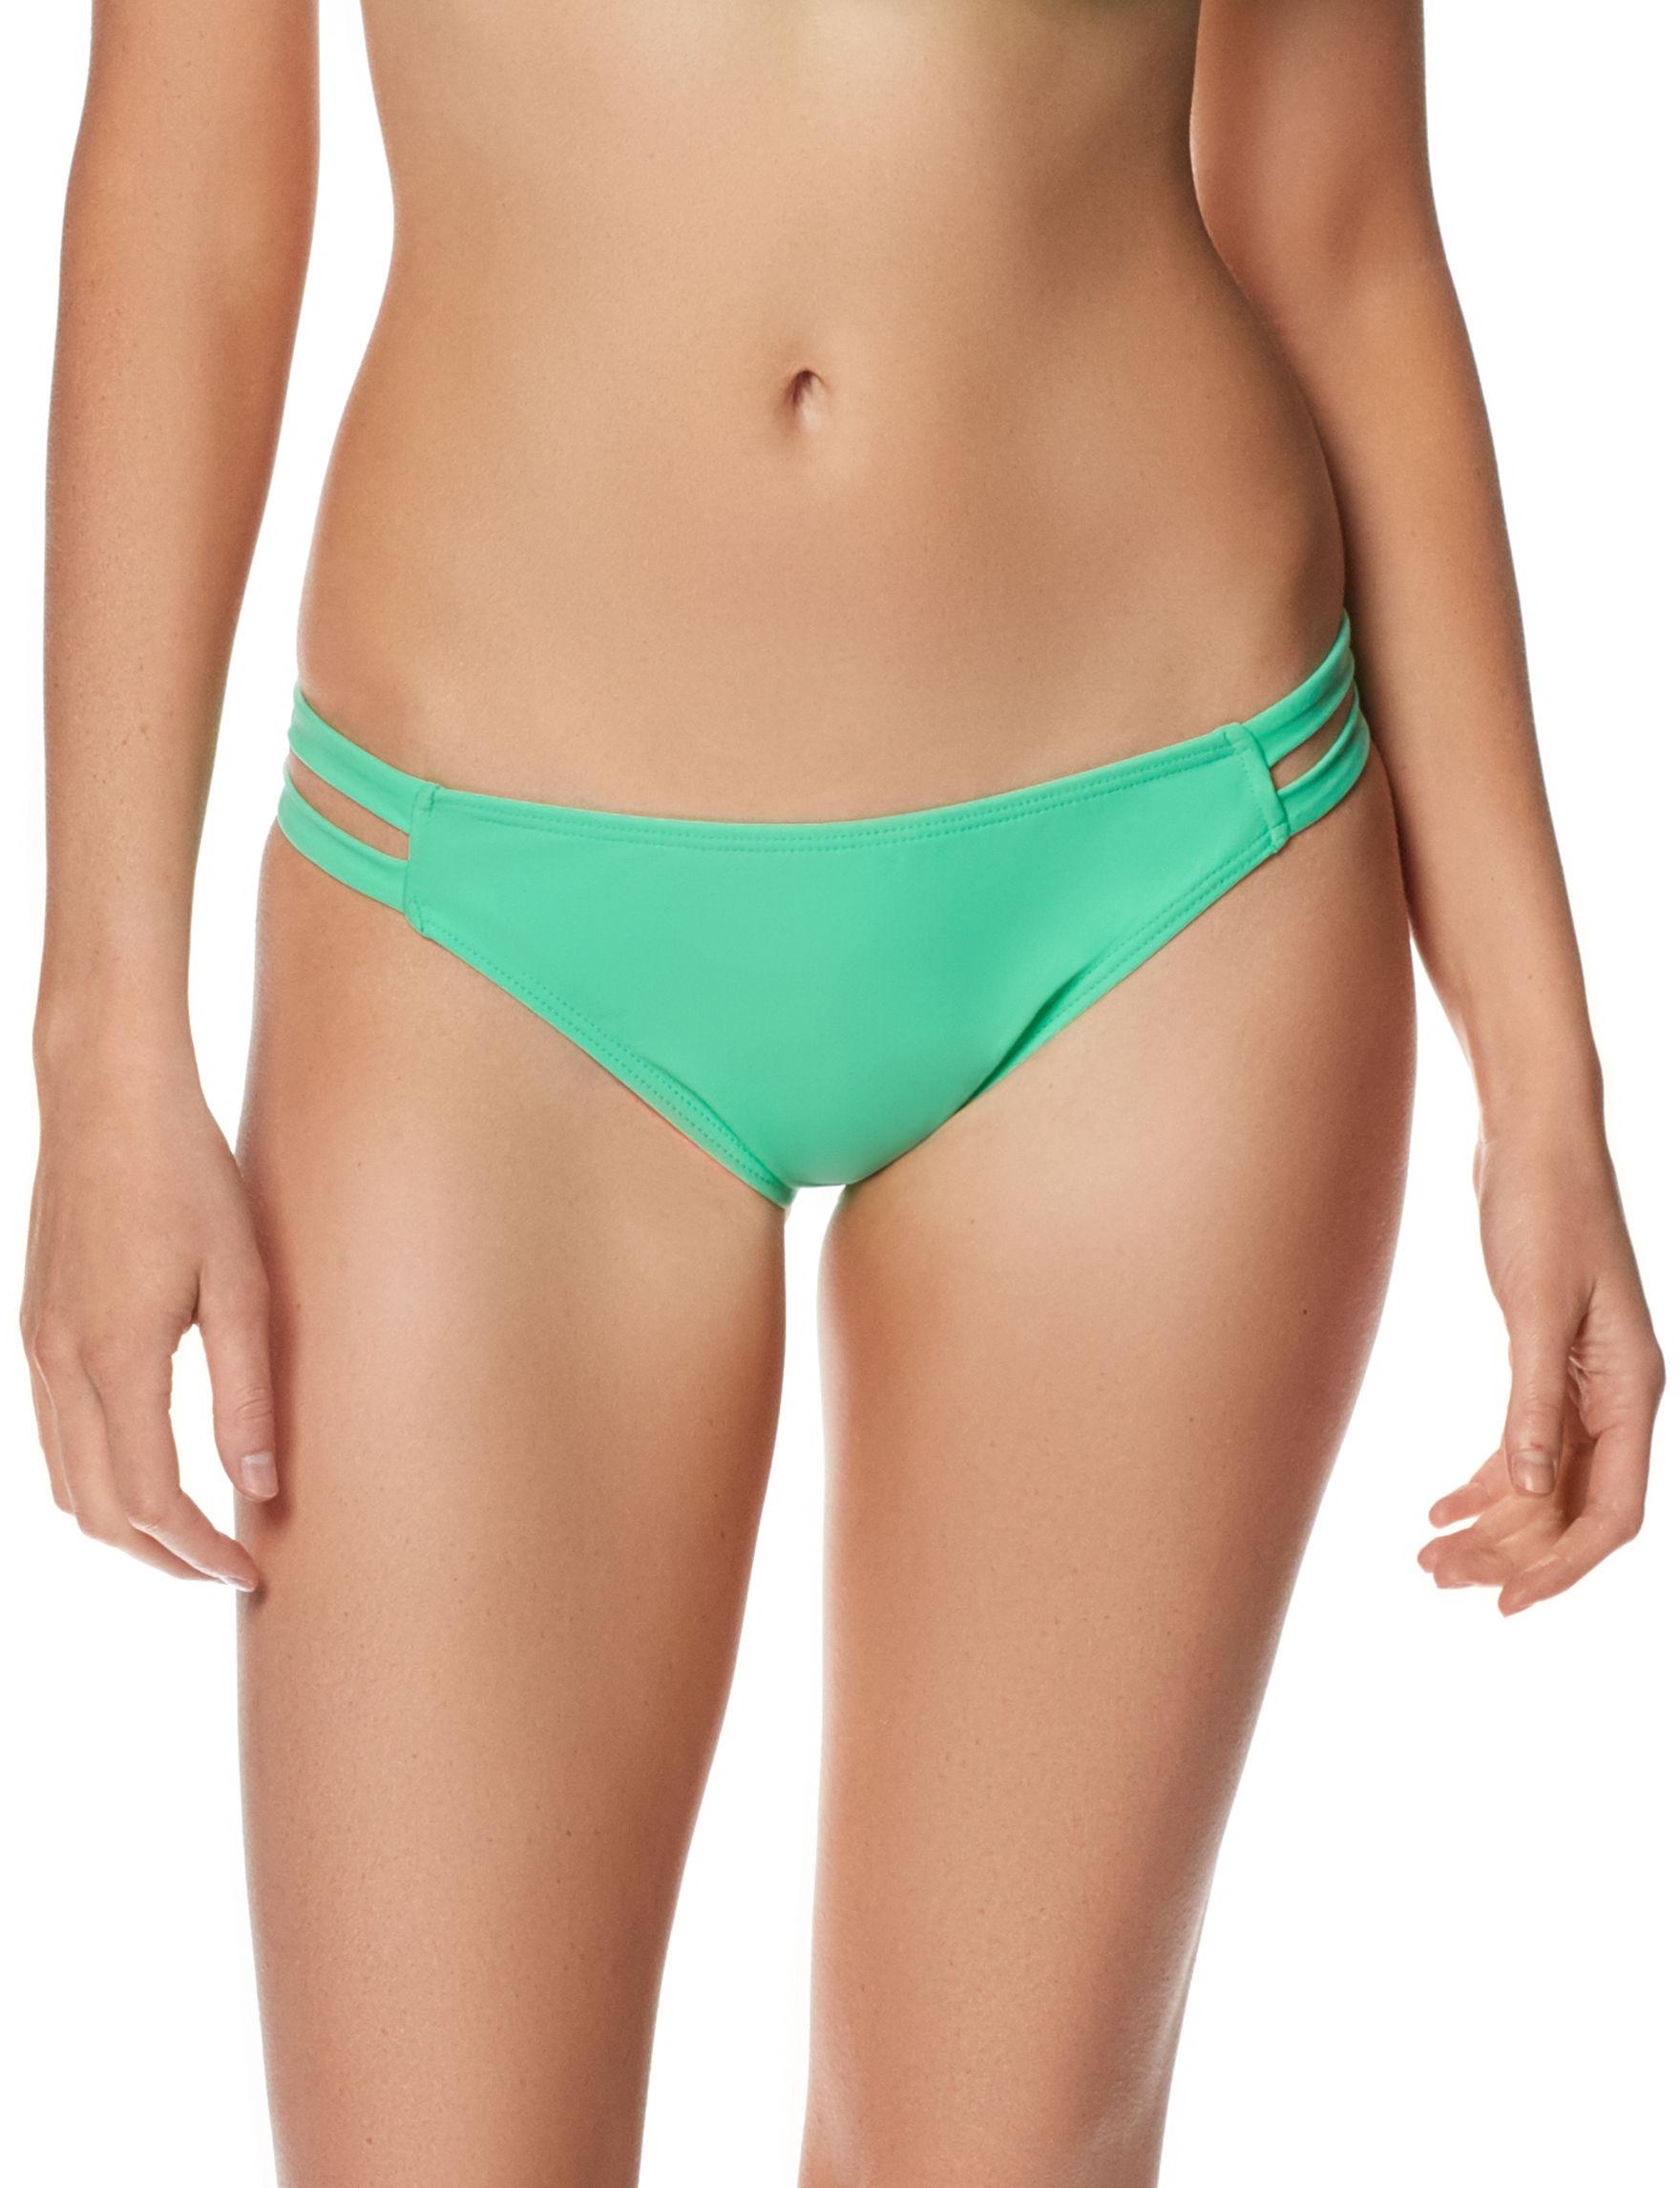 In Mocean Light Green Swimsuit Bottoms Hipster